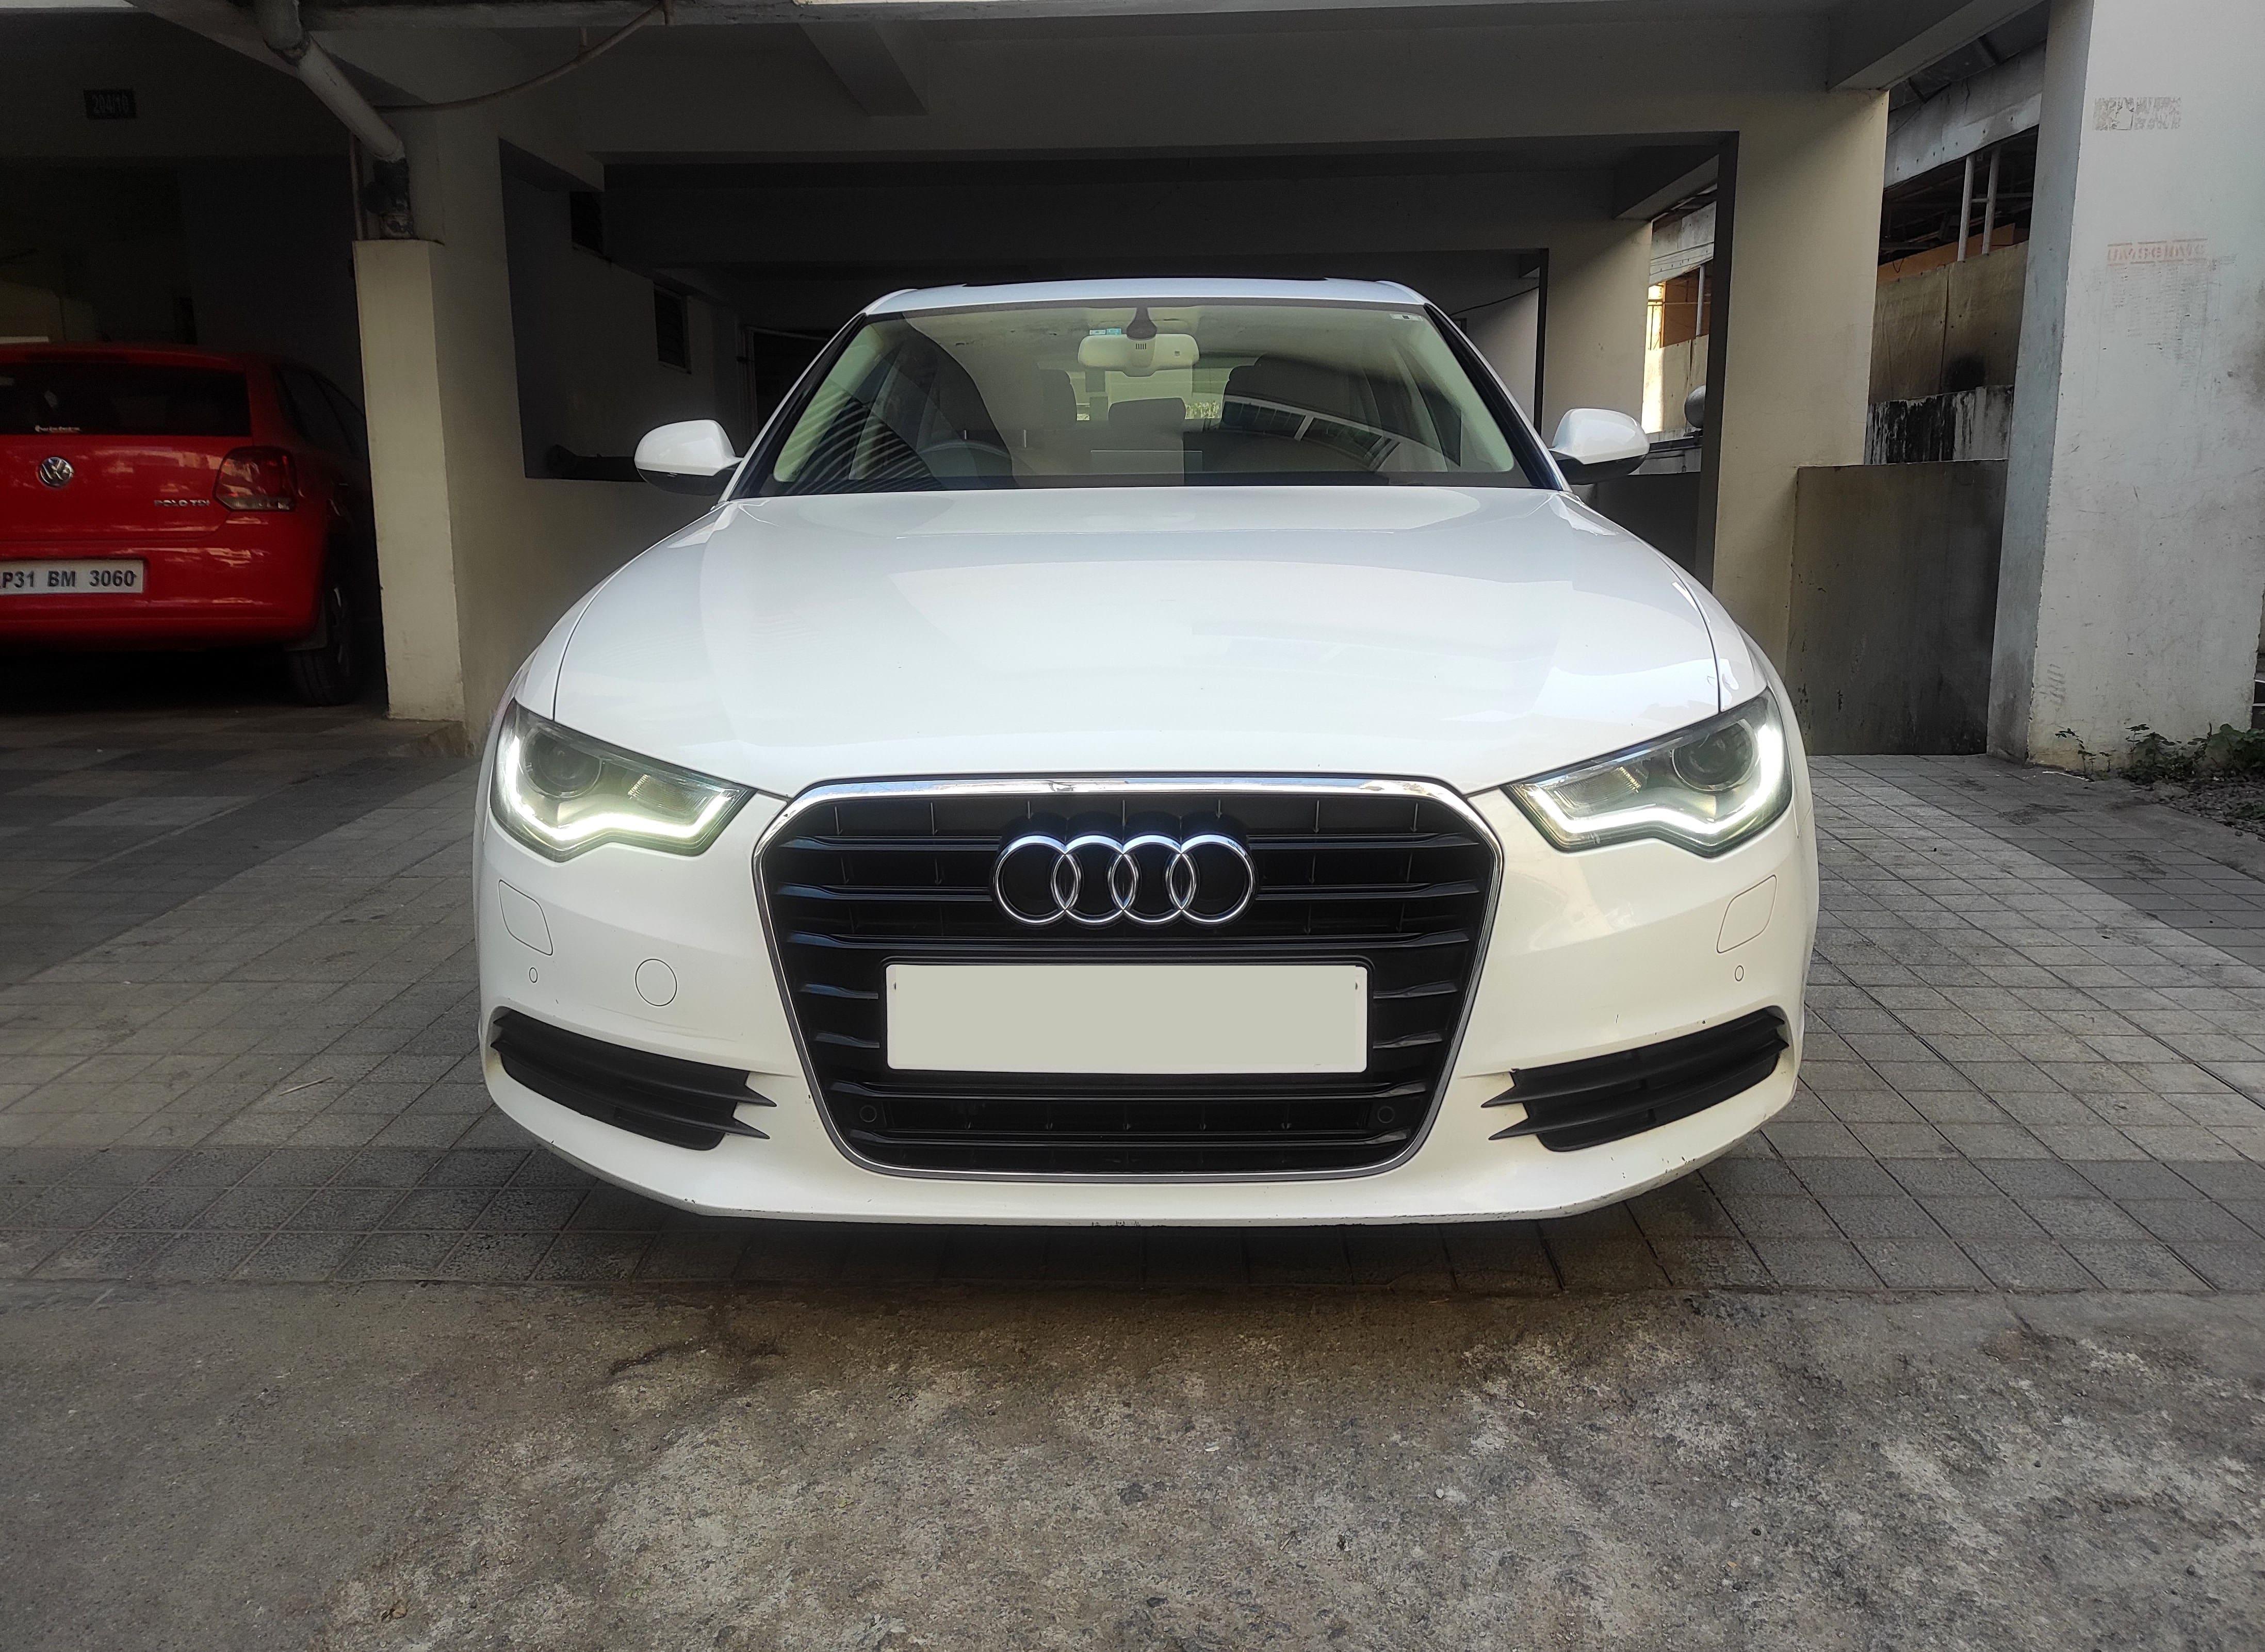 Audi A6 2015-2019 35 TDI